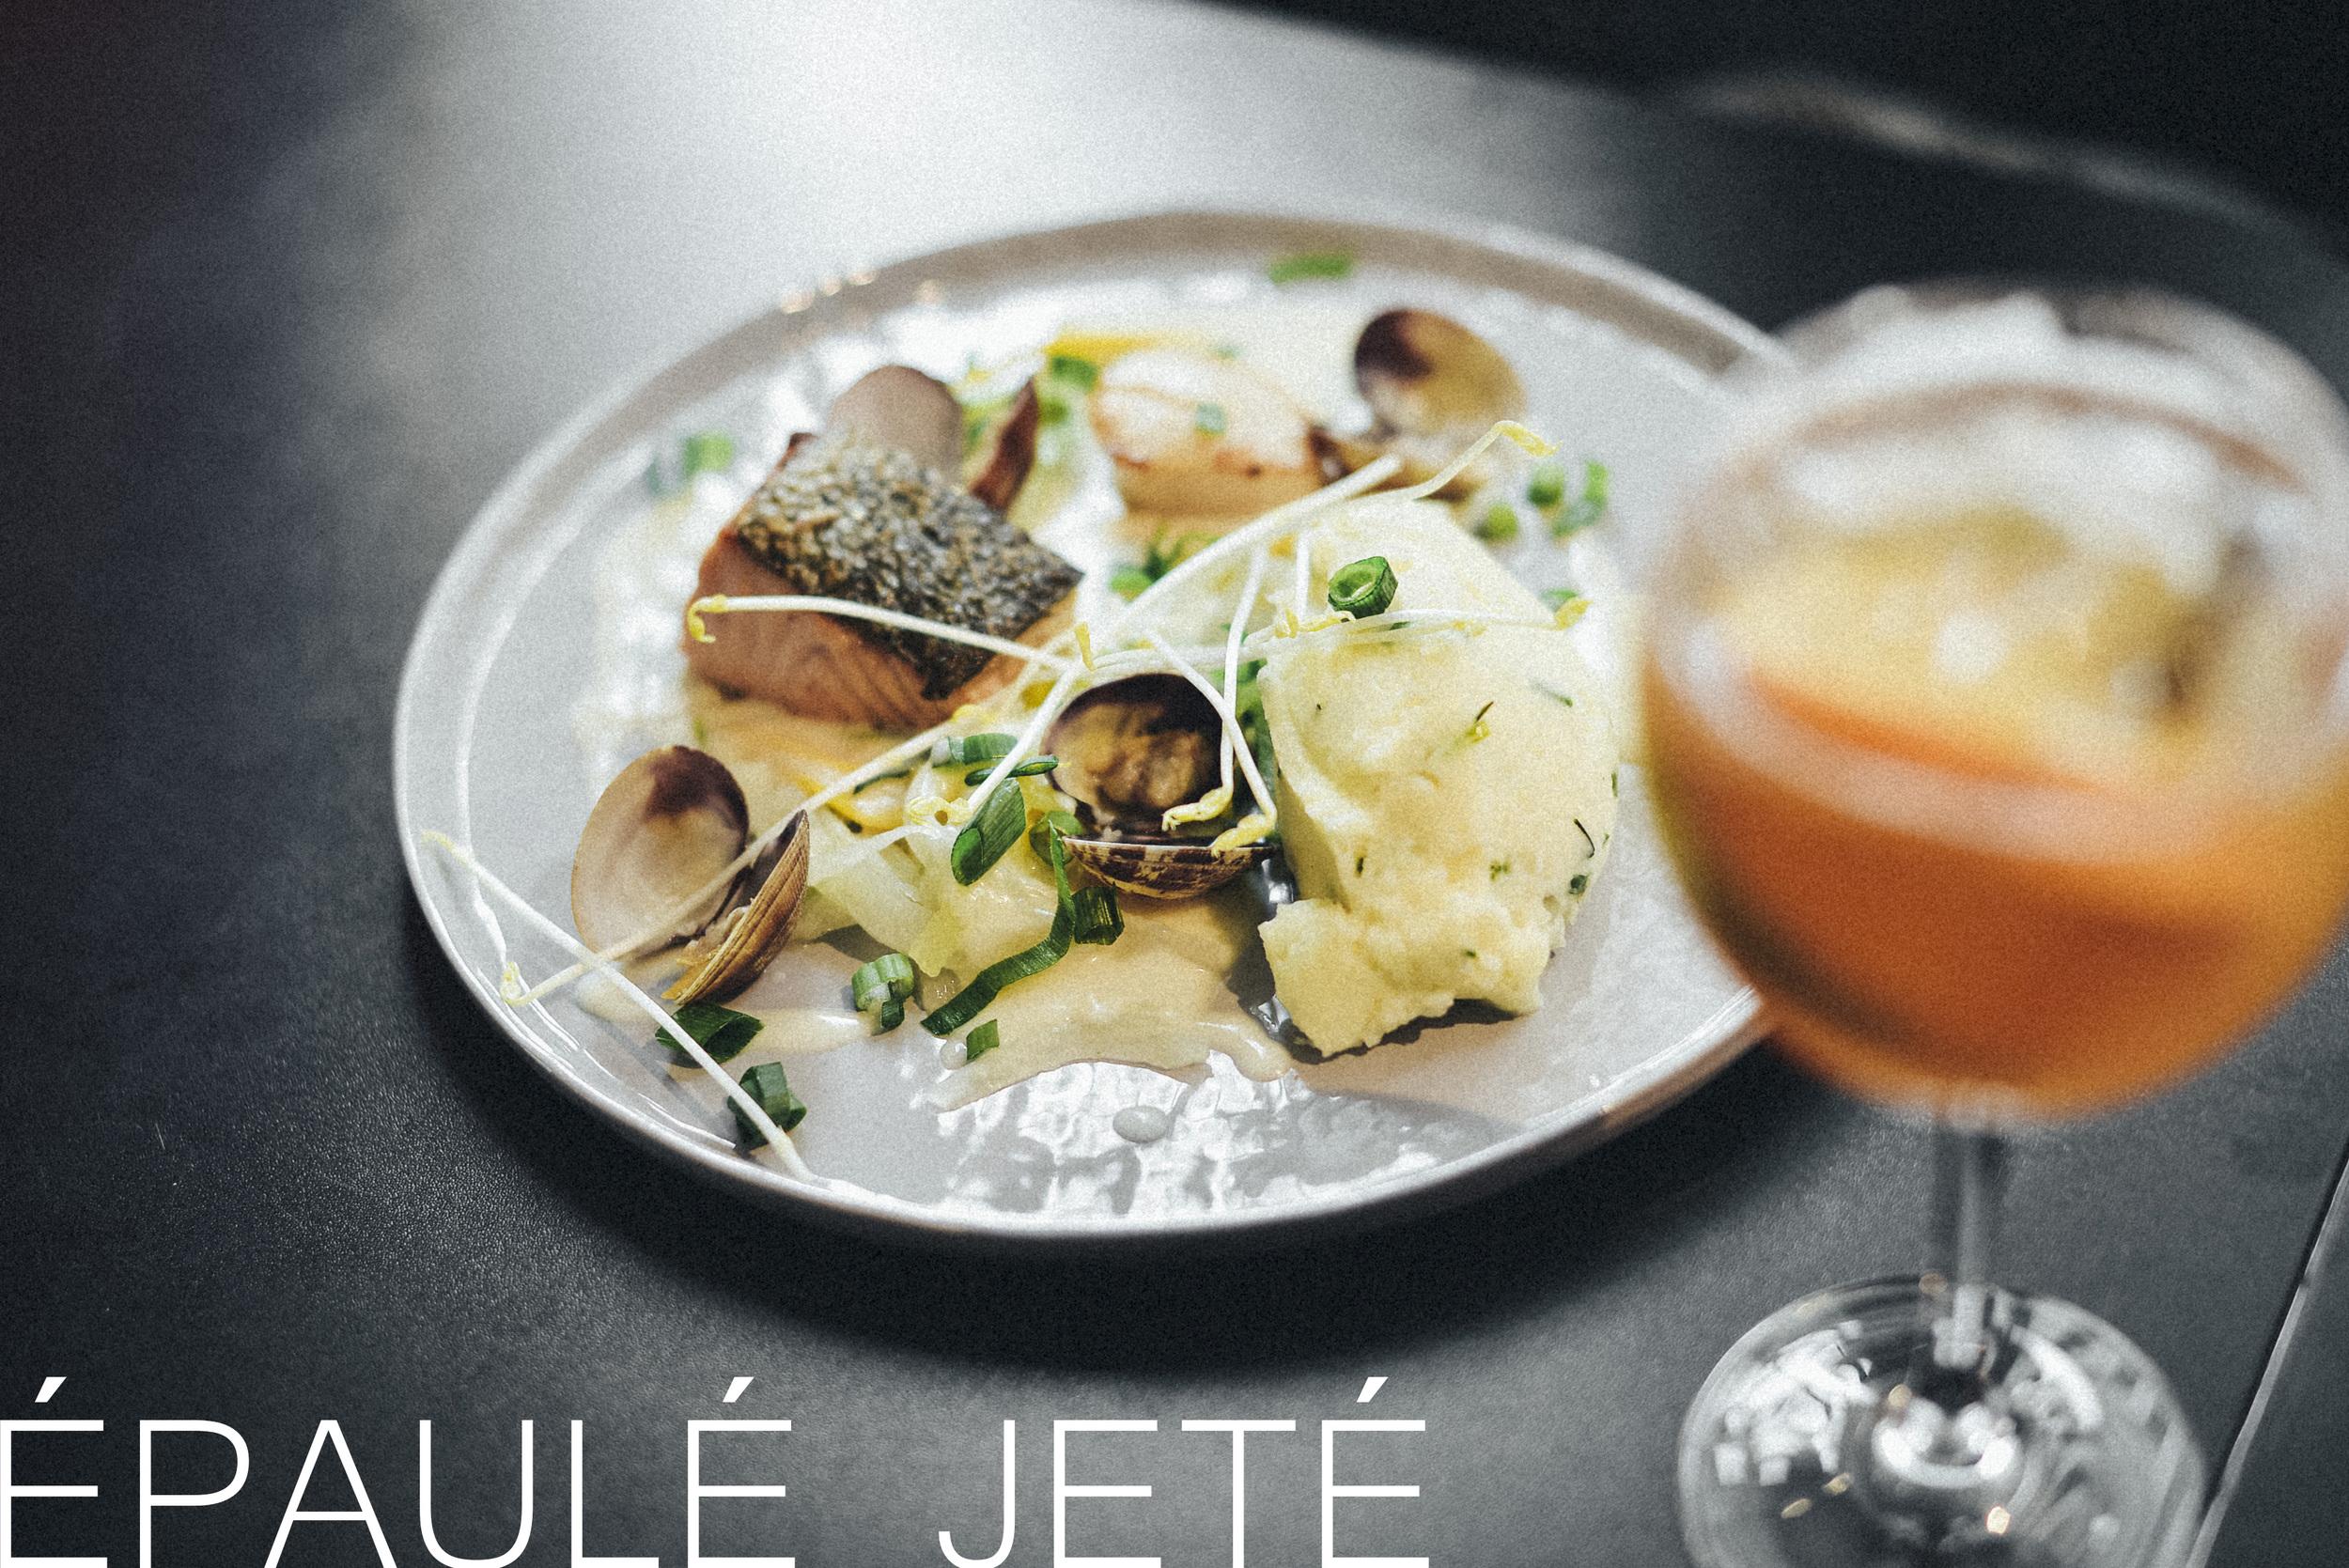 Epaulé Jeté restaurant Brussels Flagey lunch best places brunch local food and drink guide